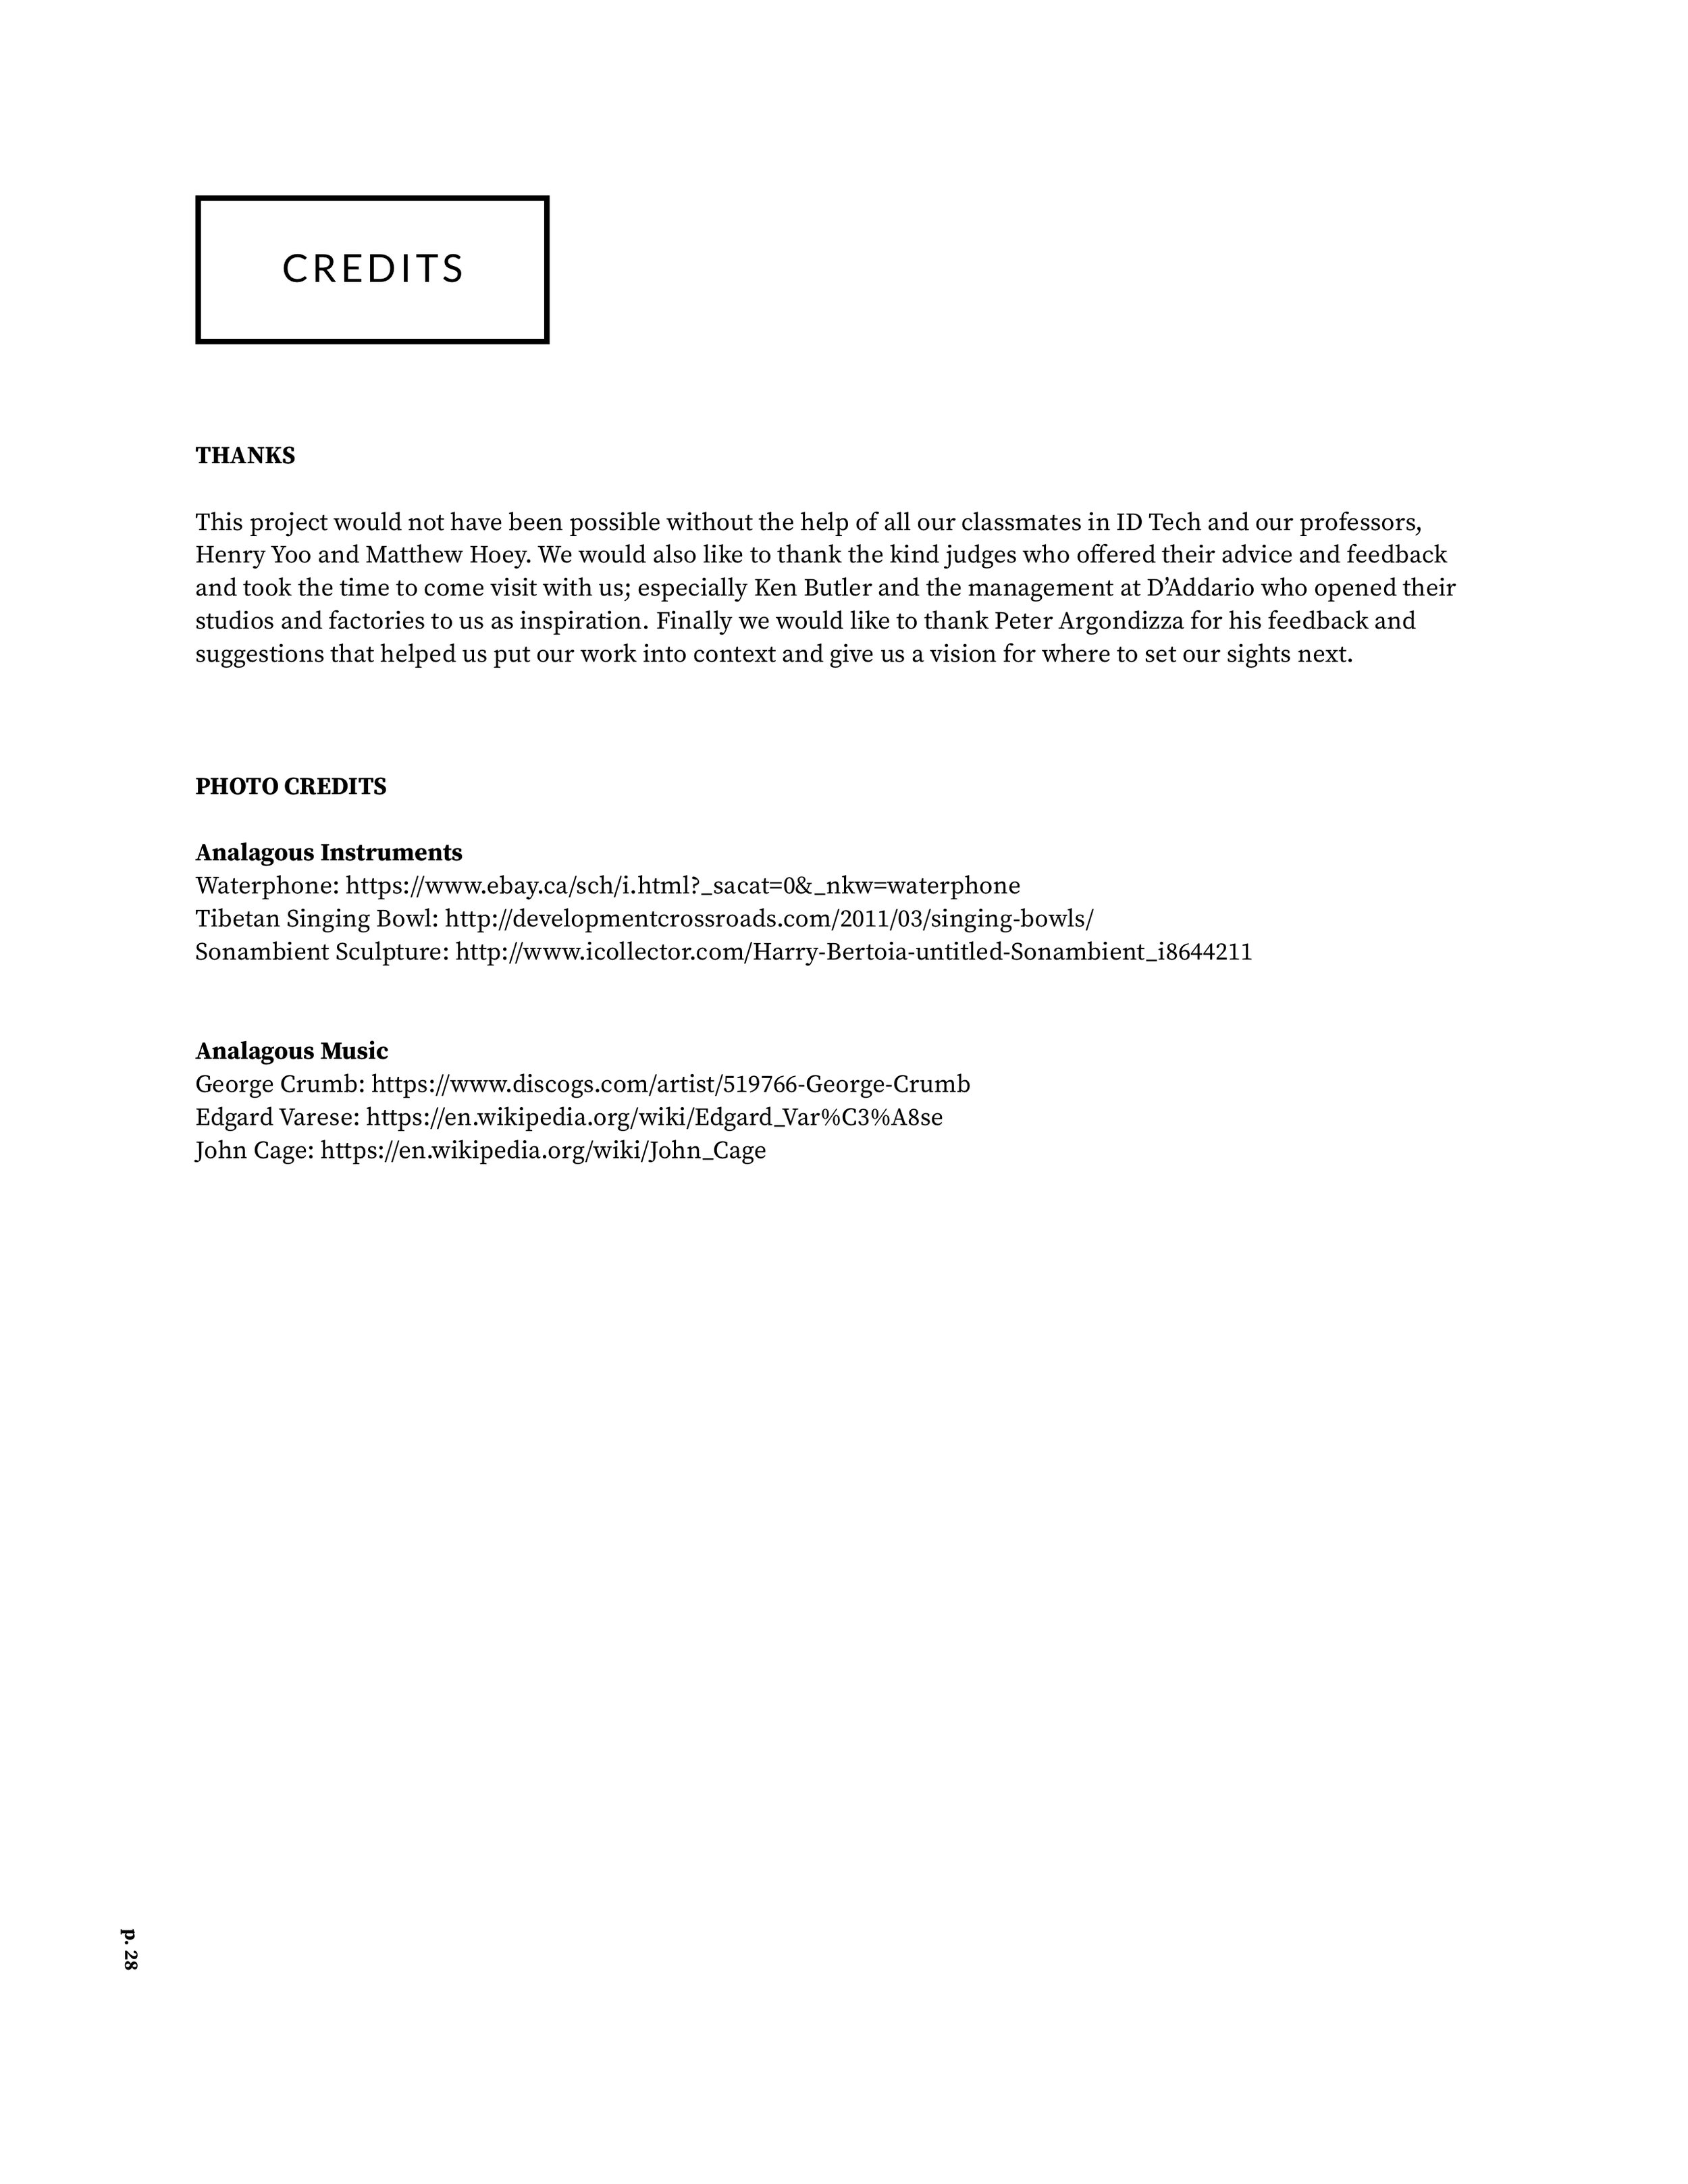 FINAL-PDF-28.jpg